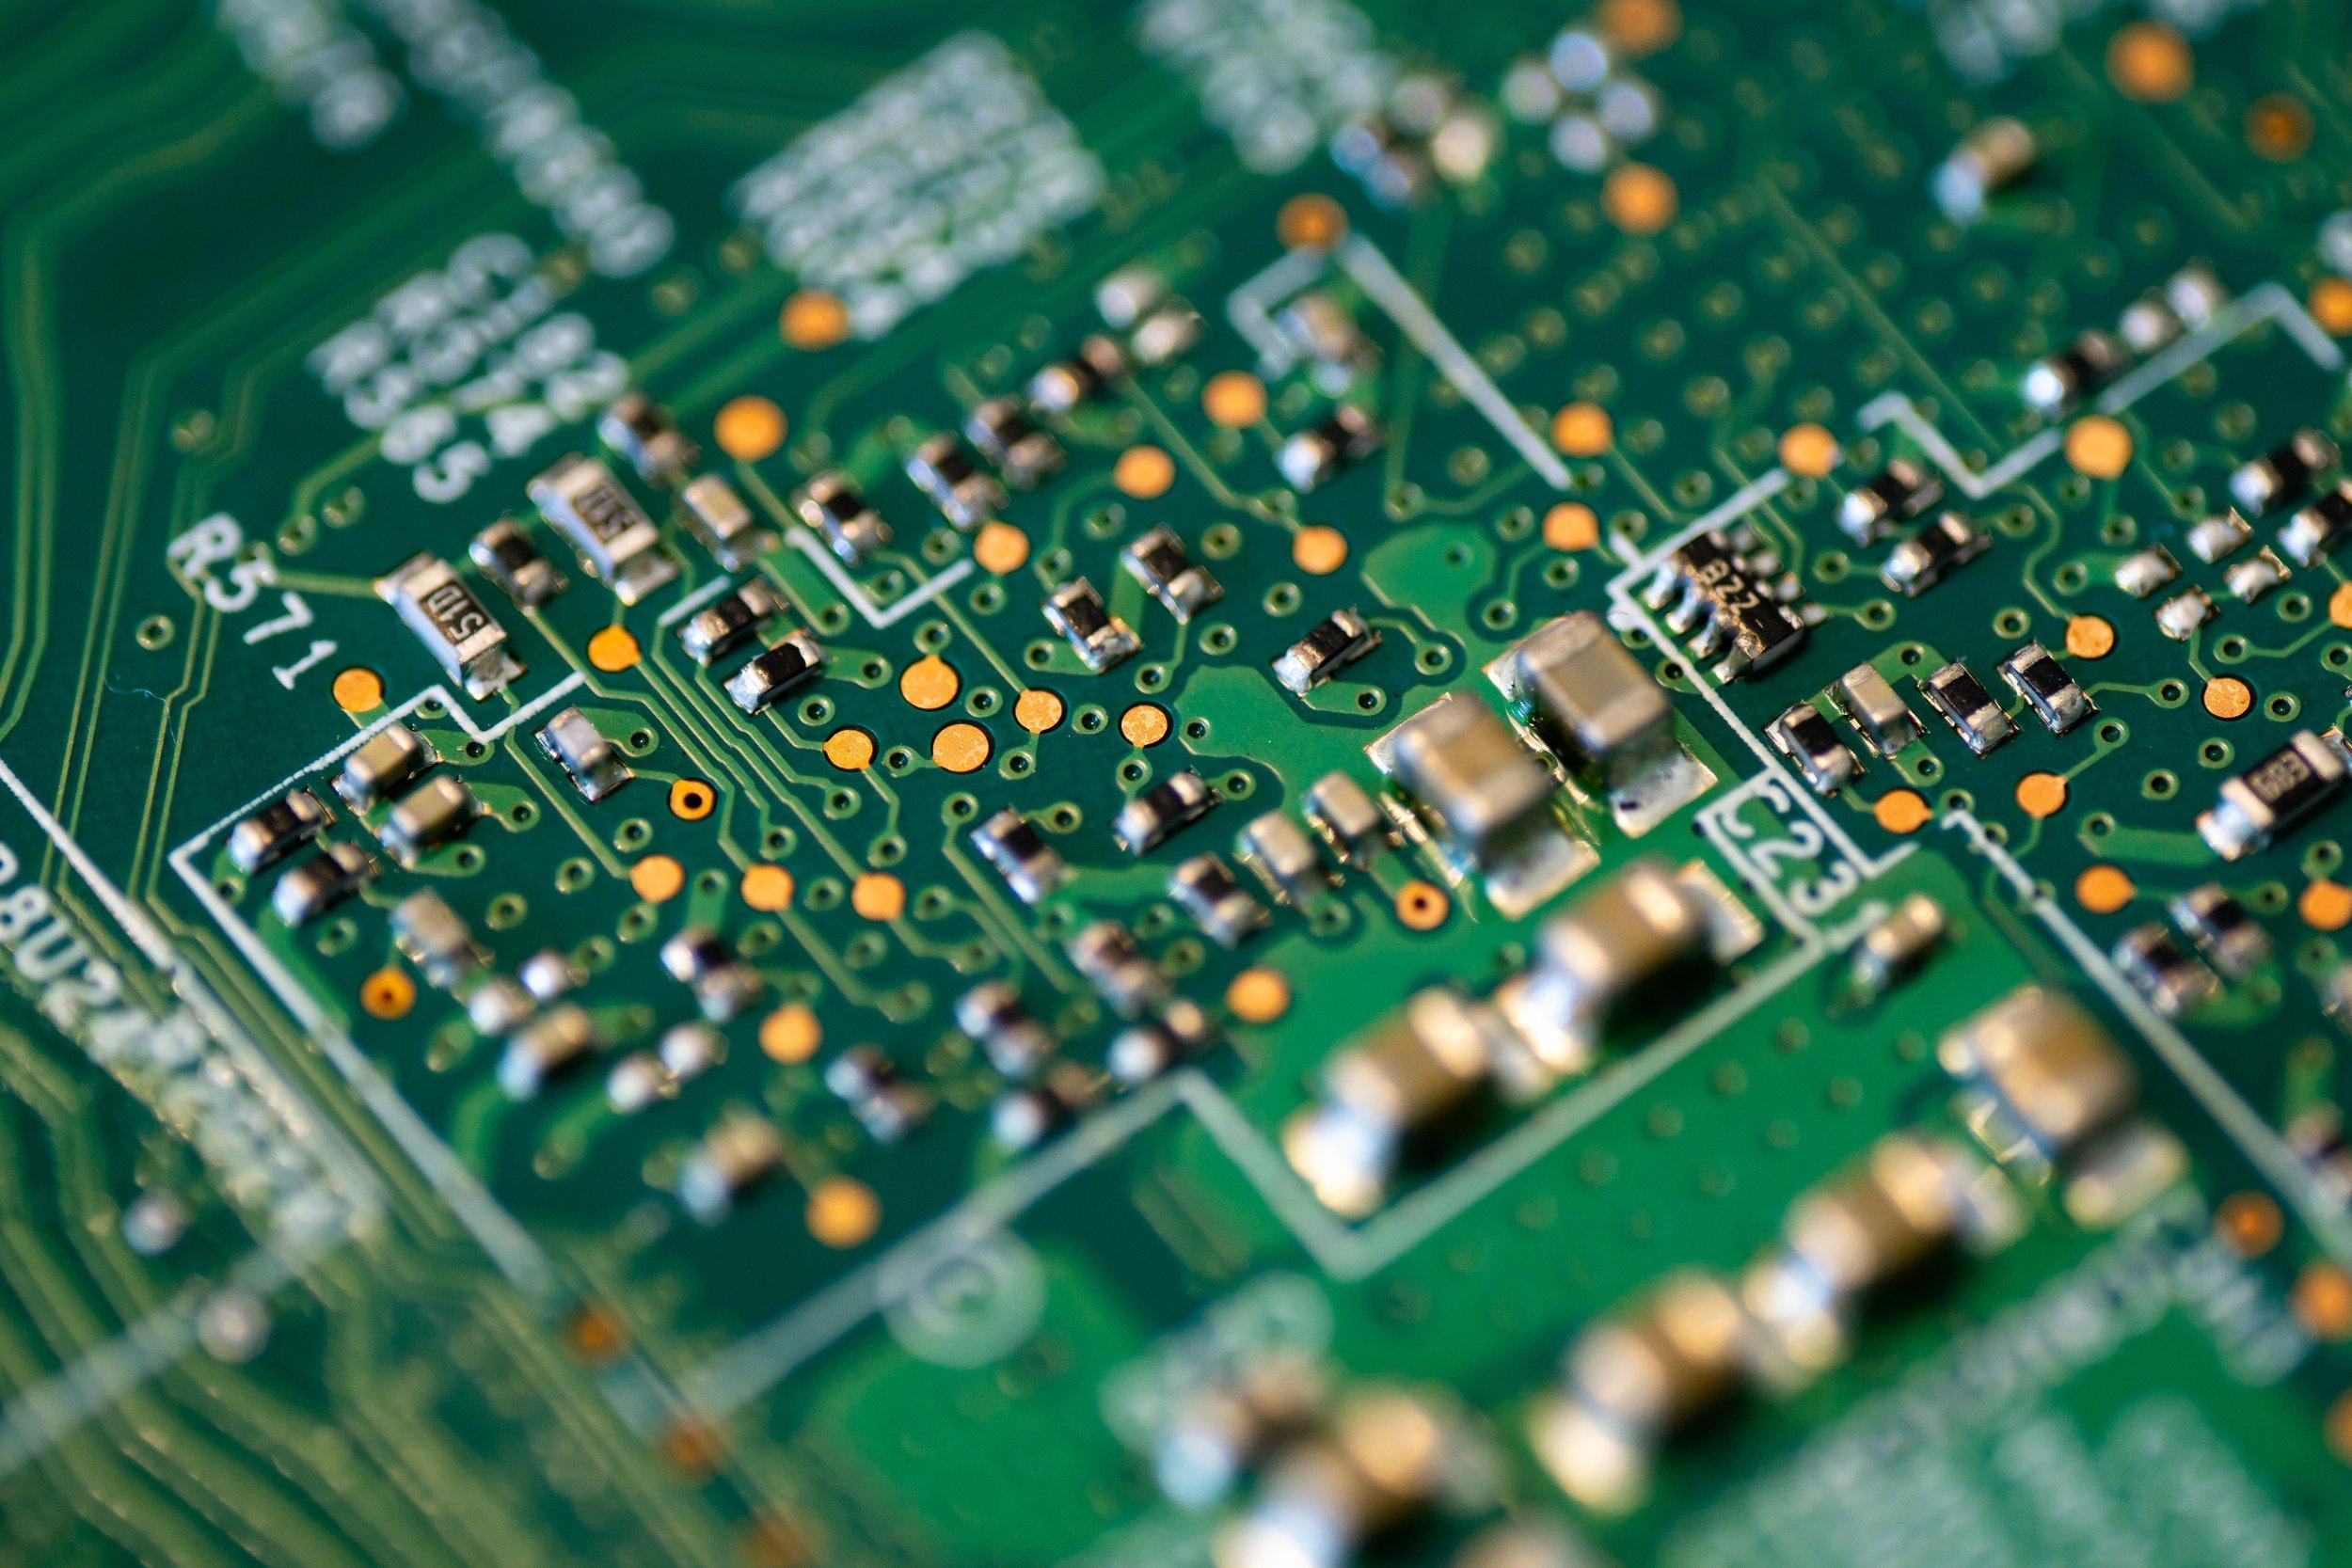 Motherboard Closeup Macro shot